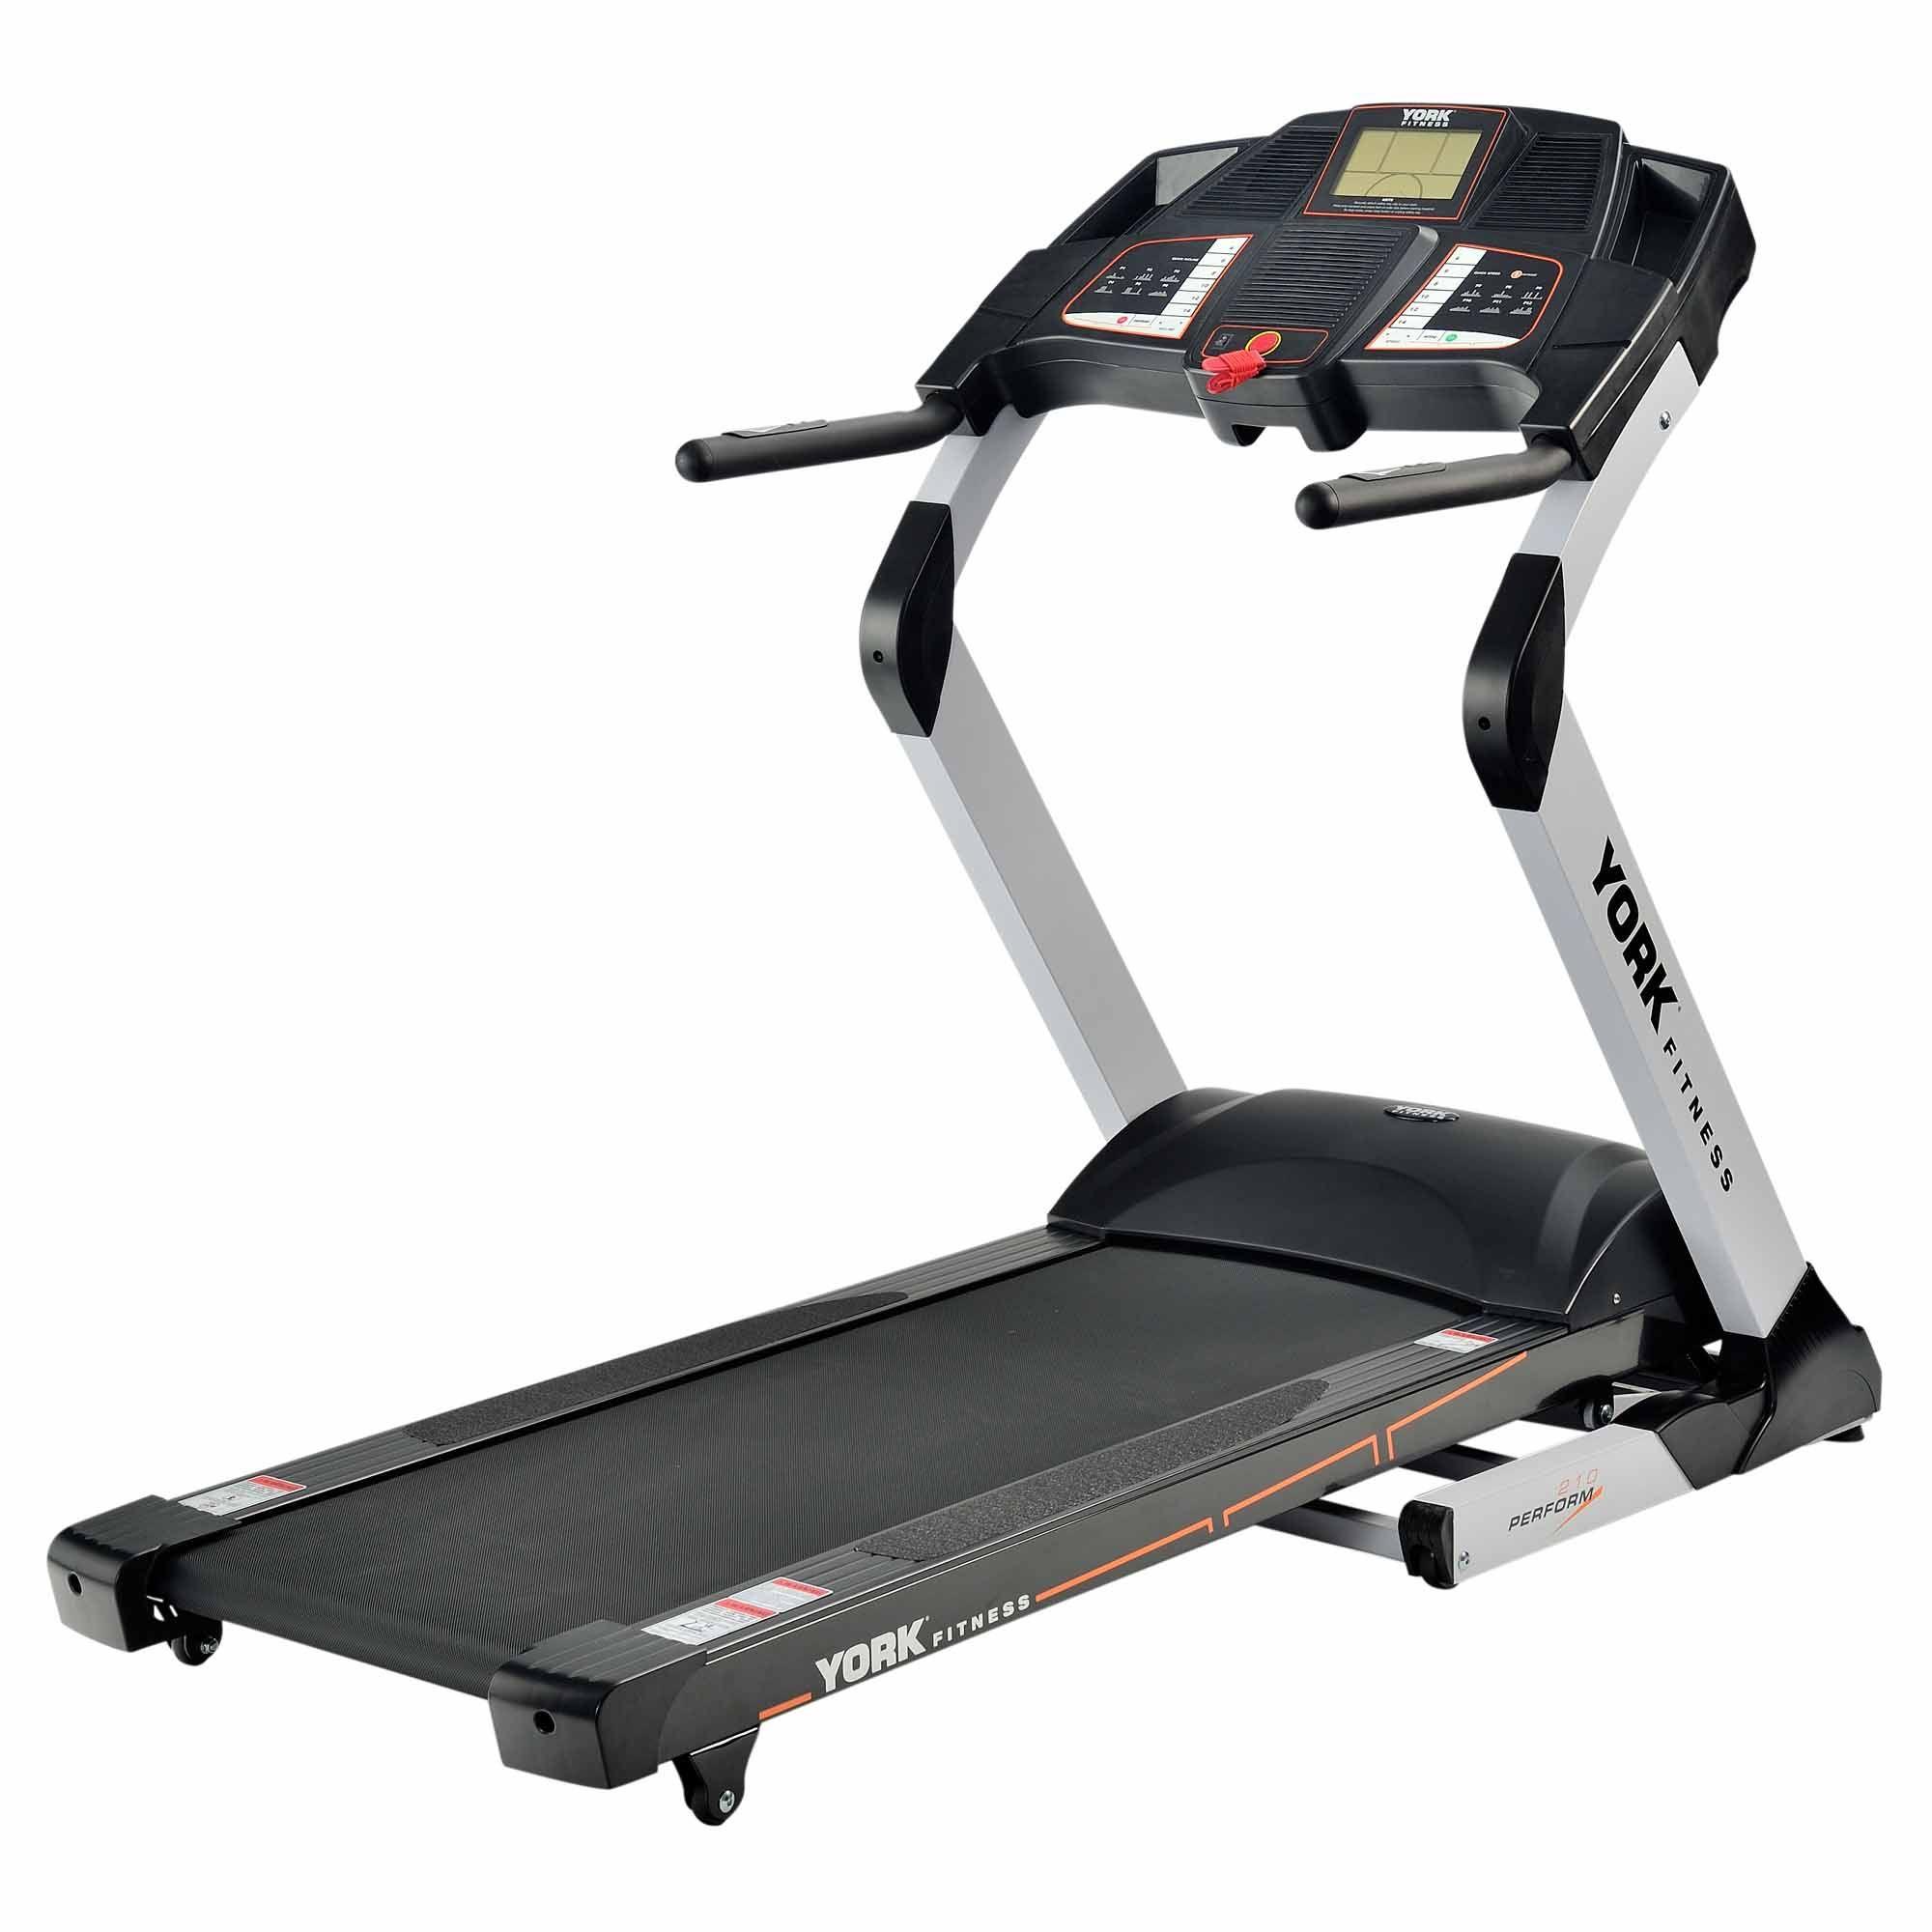 York Perform 210 Treadmill Sweatband Com